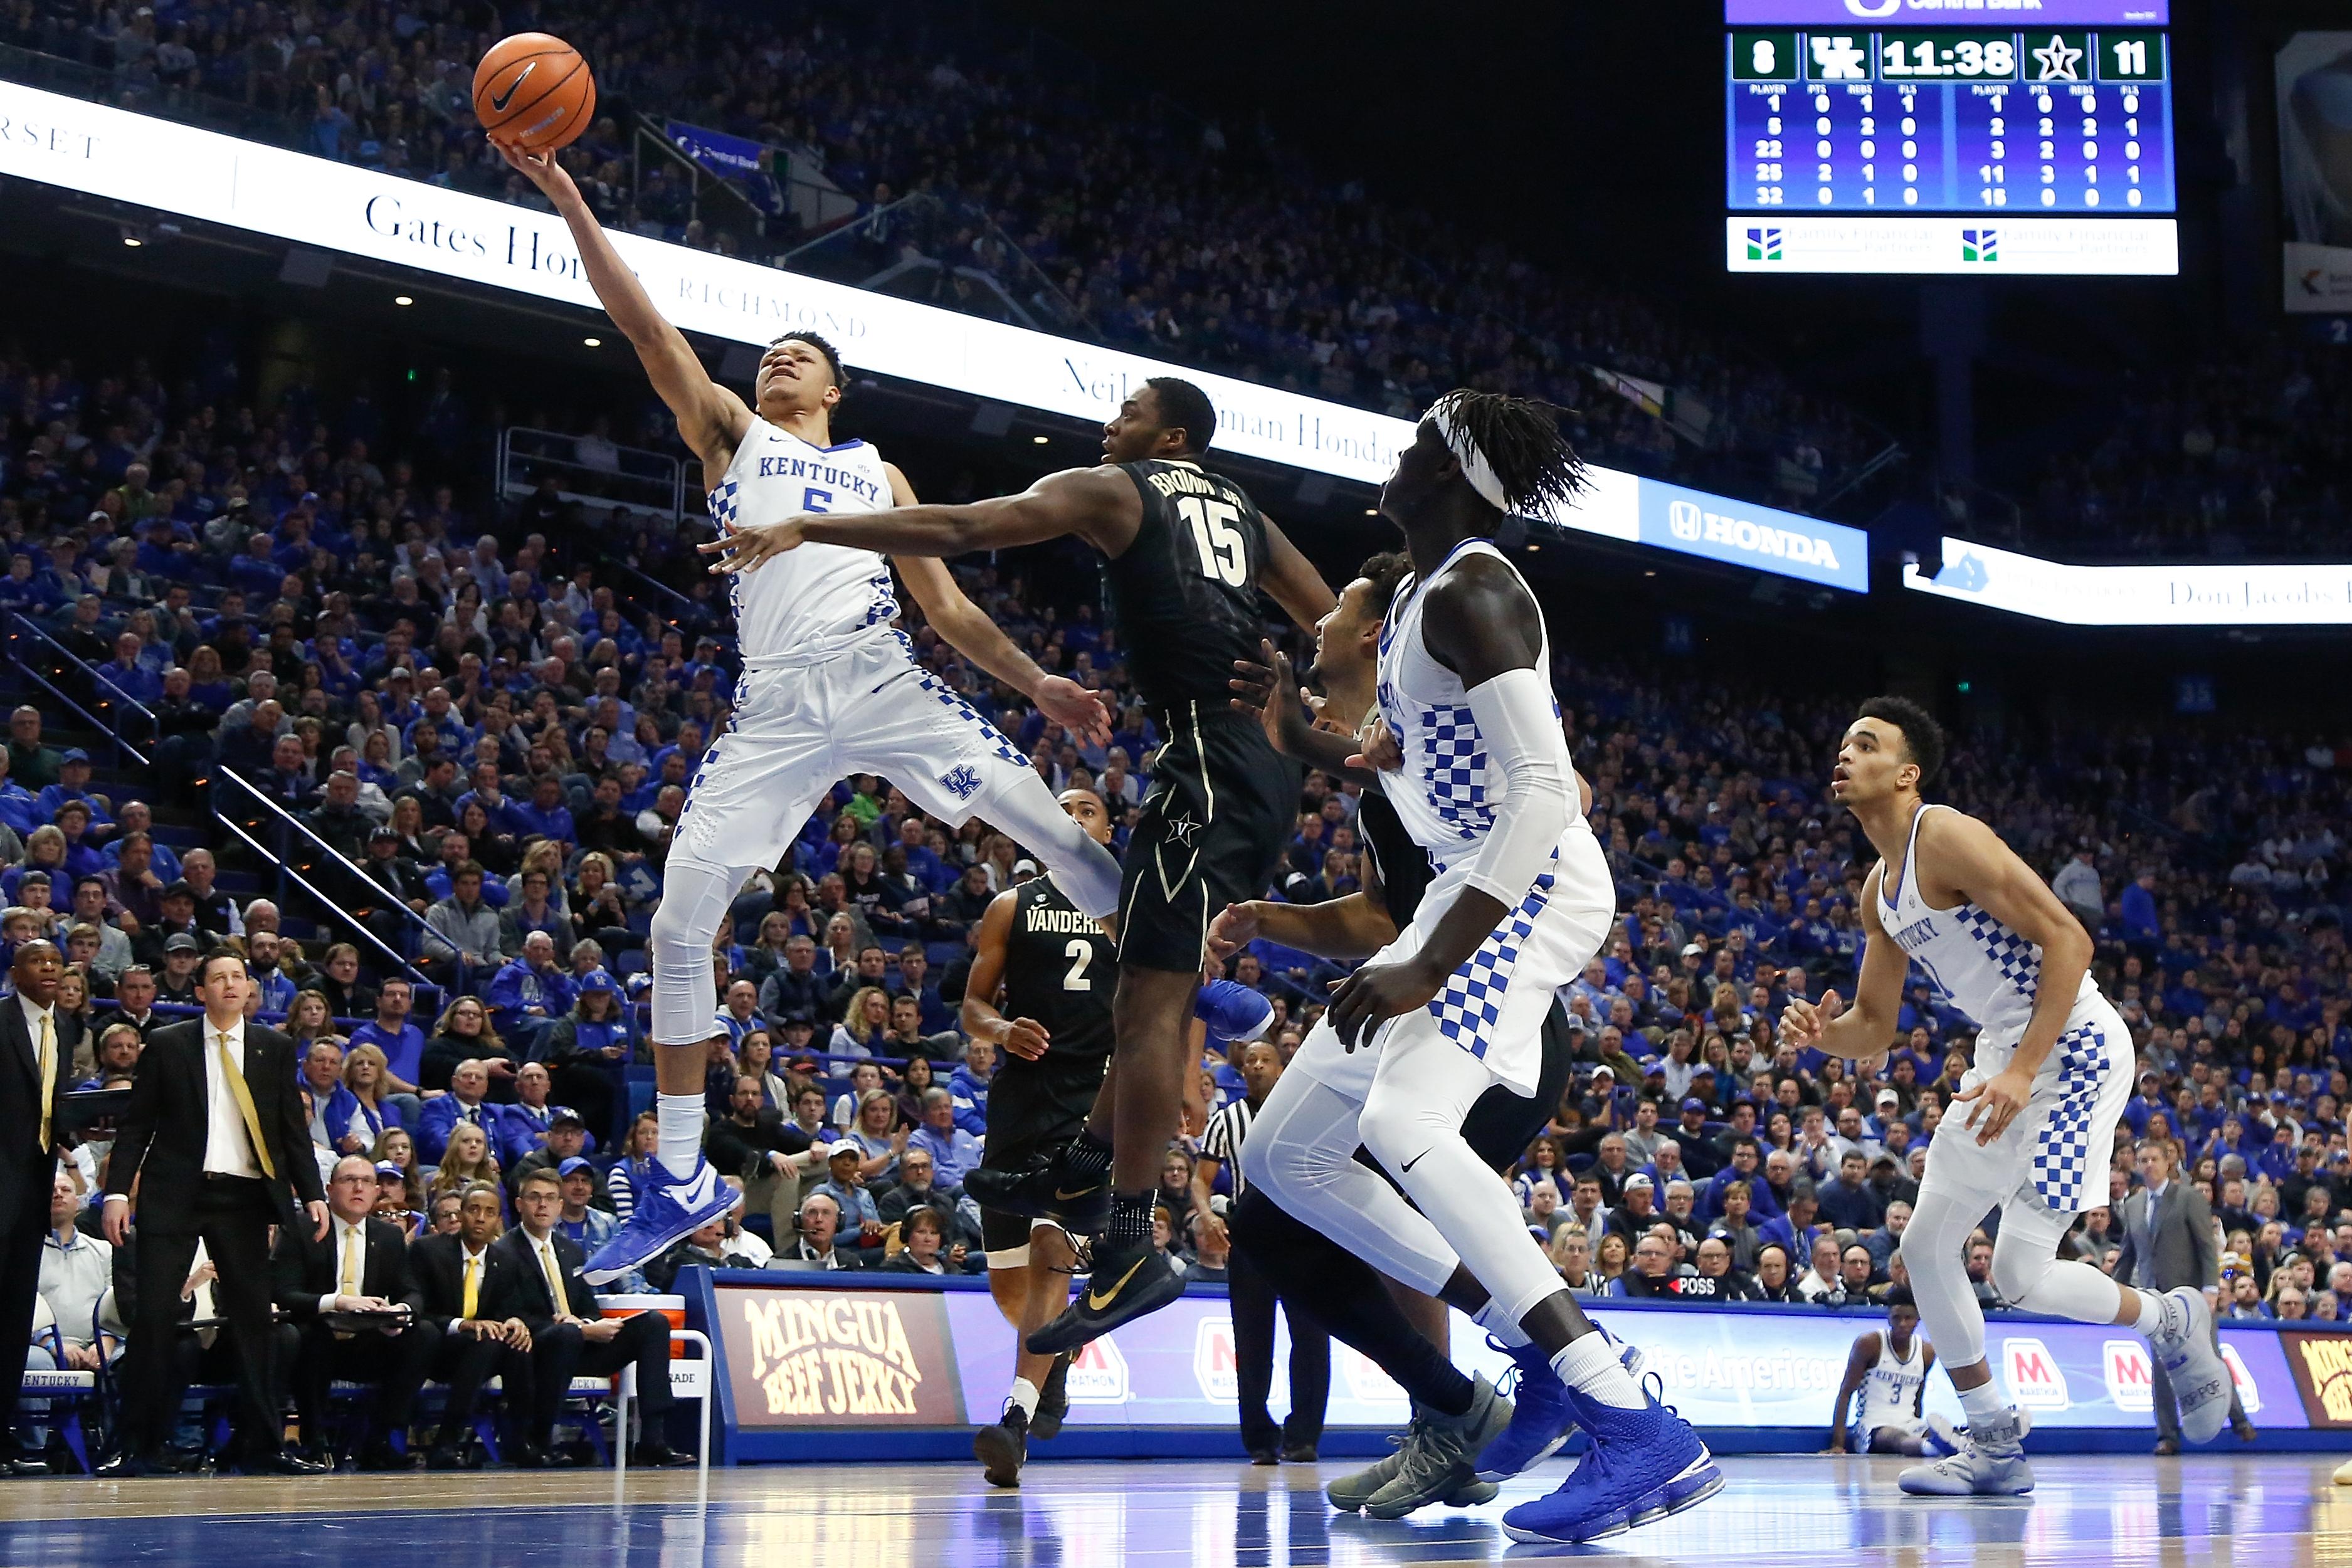 Kentucky's Quade Green drives for game-winning layup vs. Vanderbilt